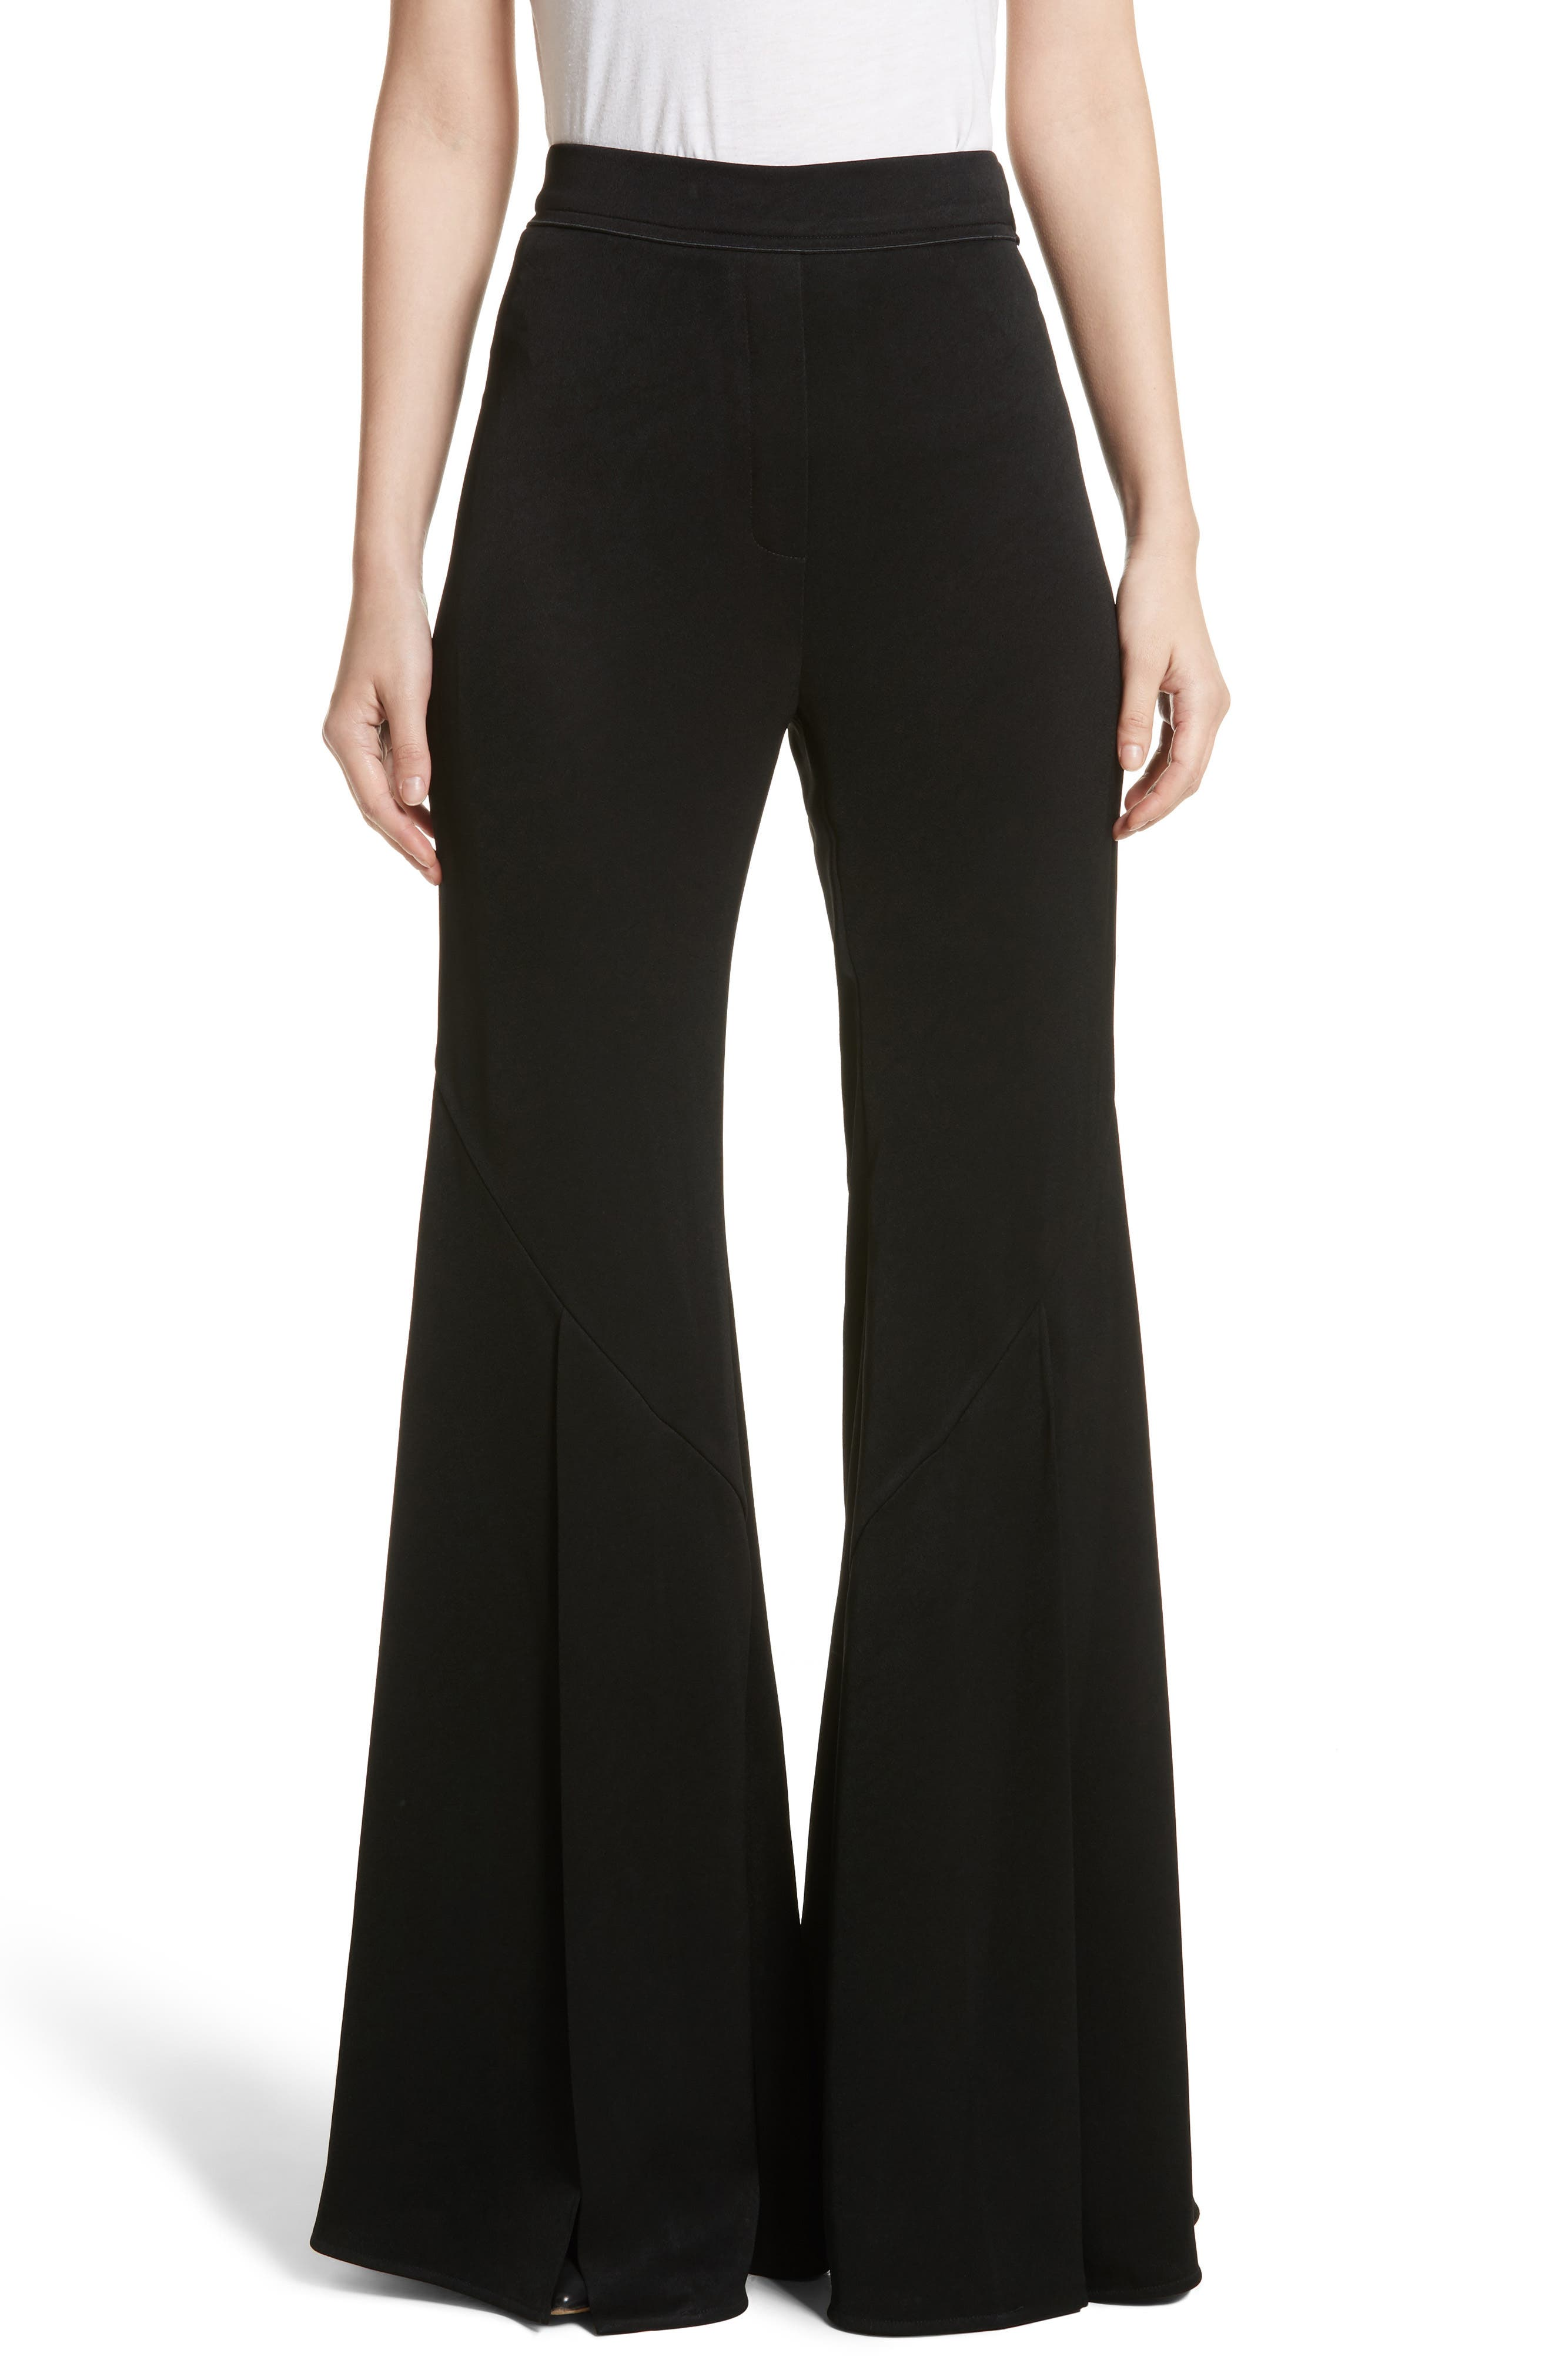 Higher & Higher Wide Flare Leg Pants,                         Main,                         color, 001